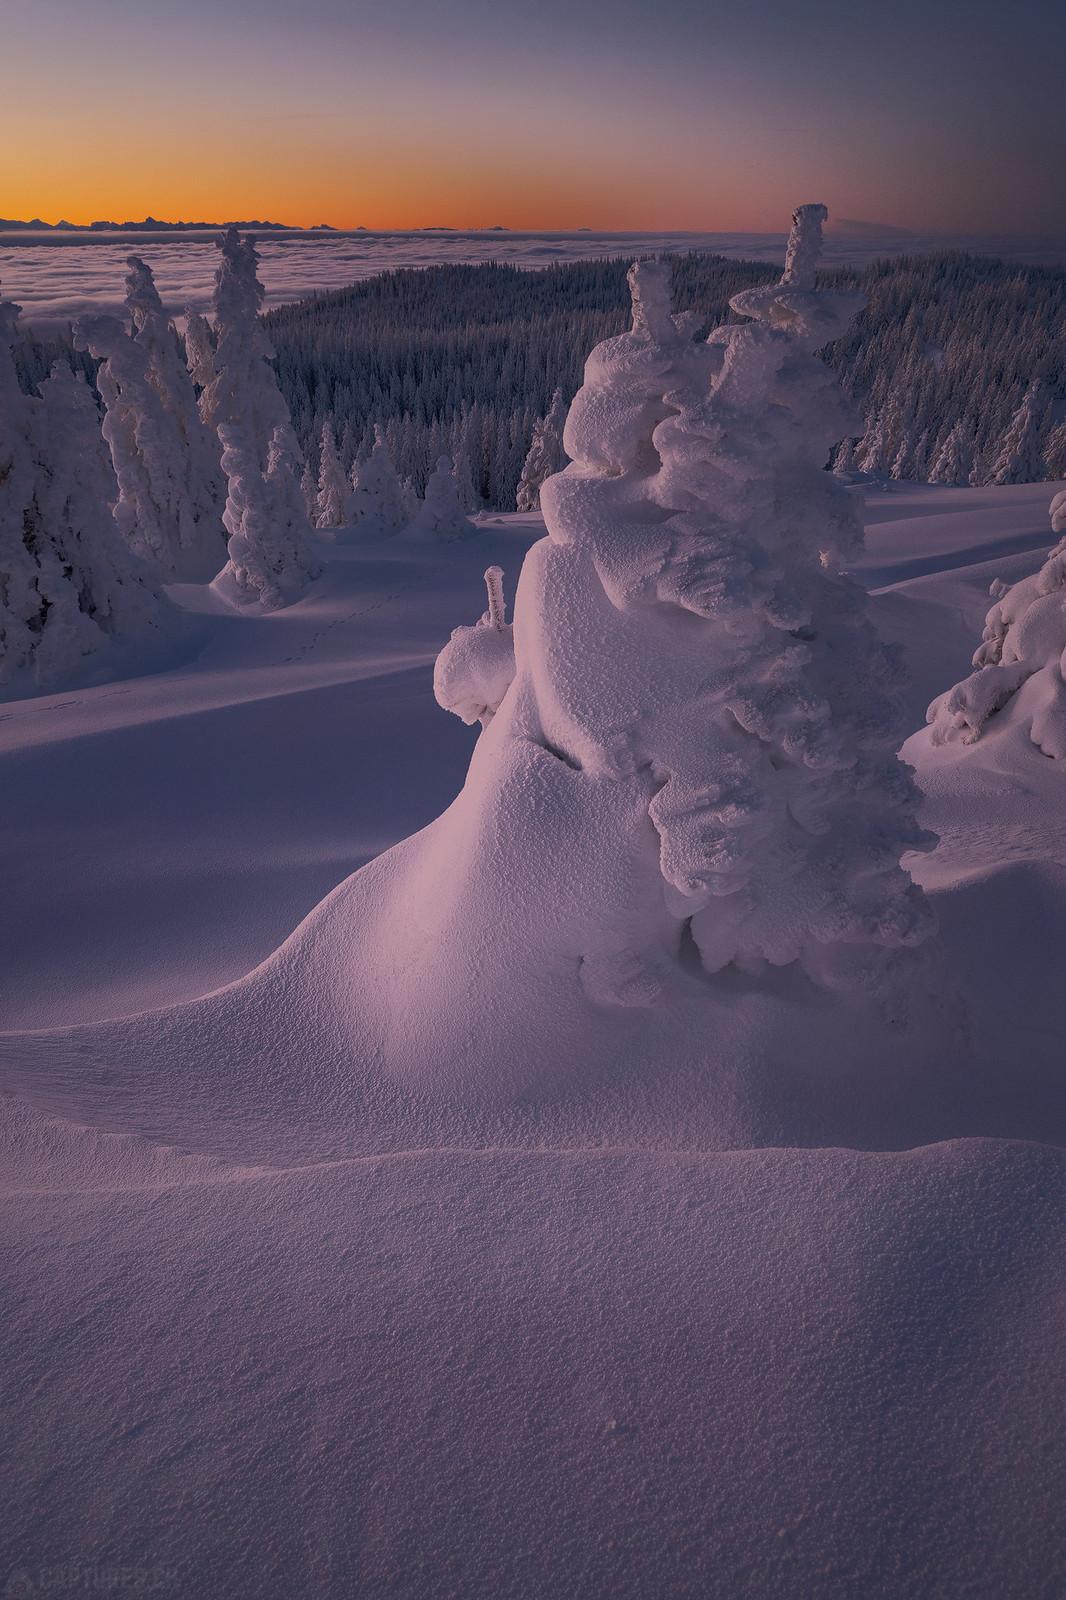 Snow creature - Jura